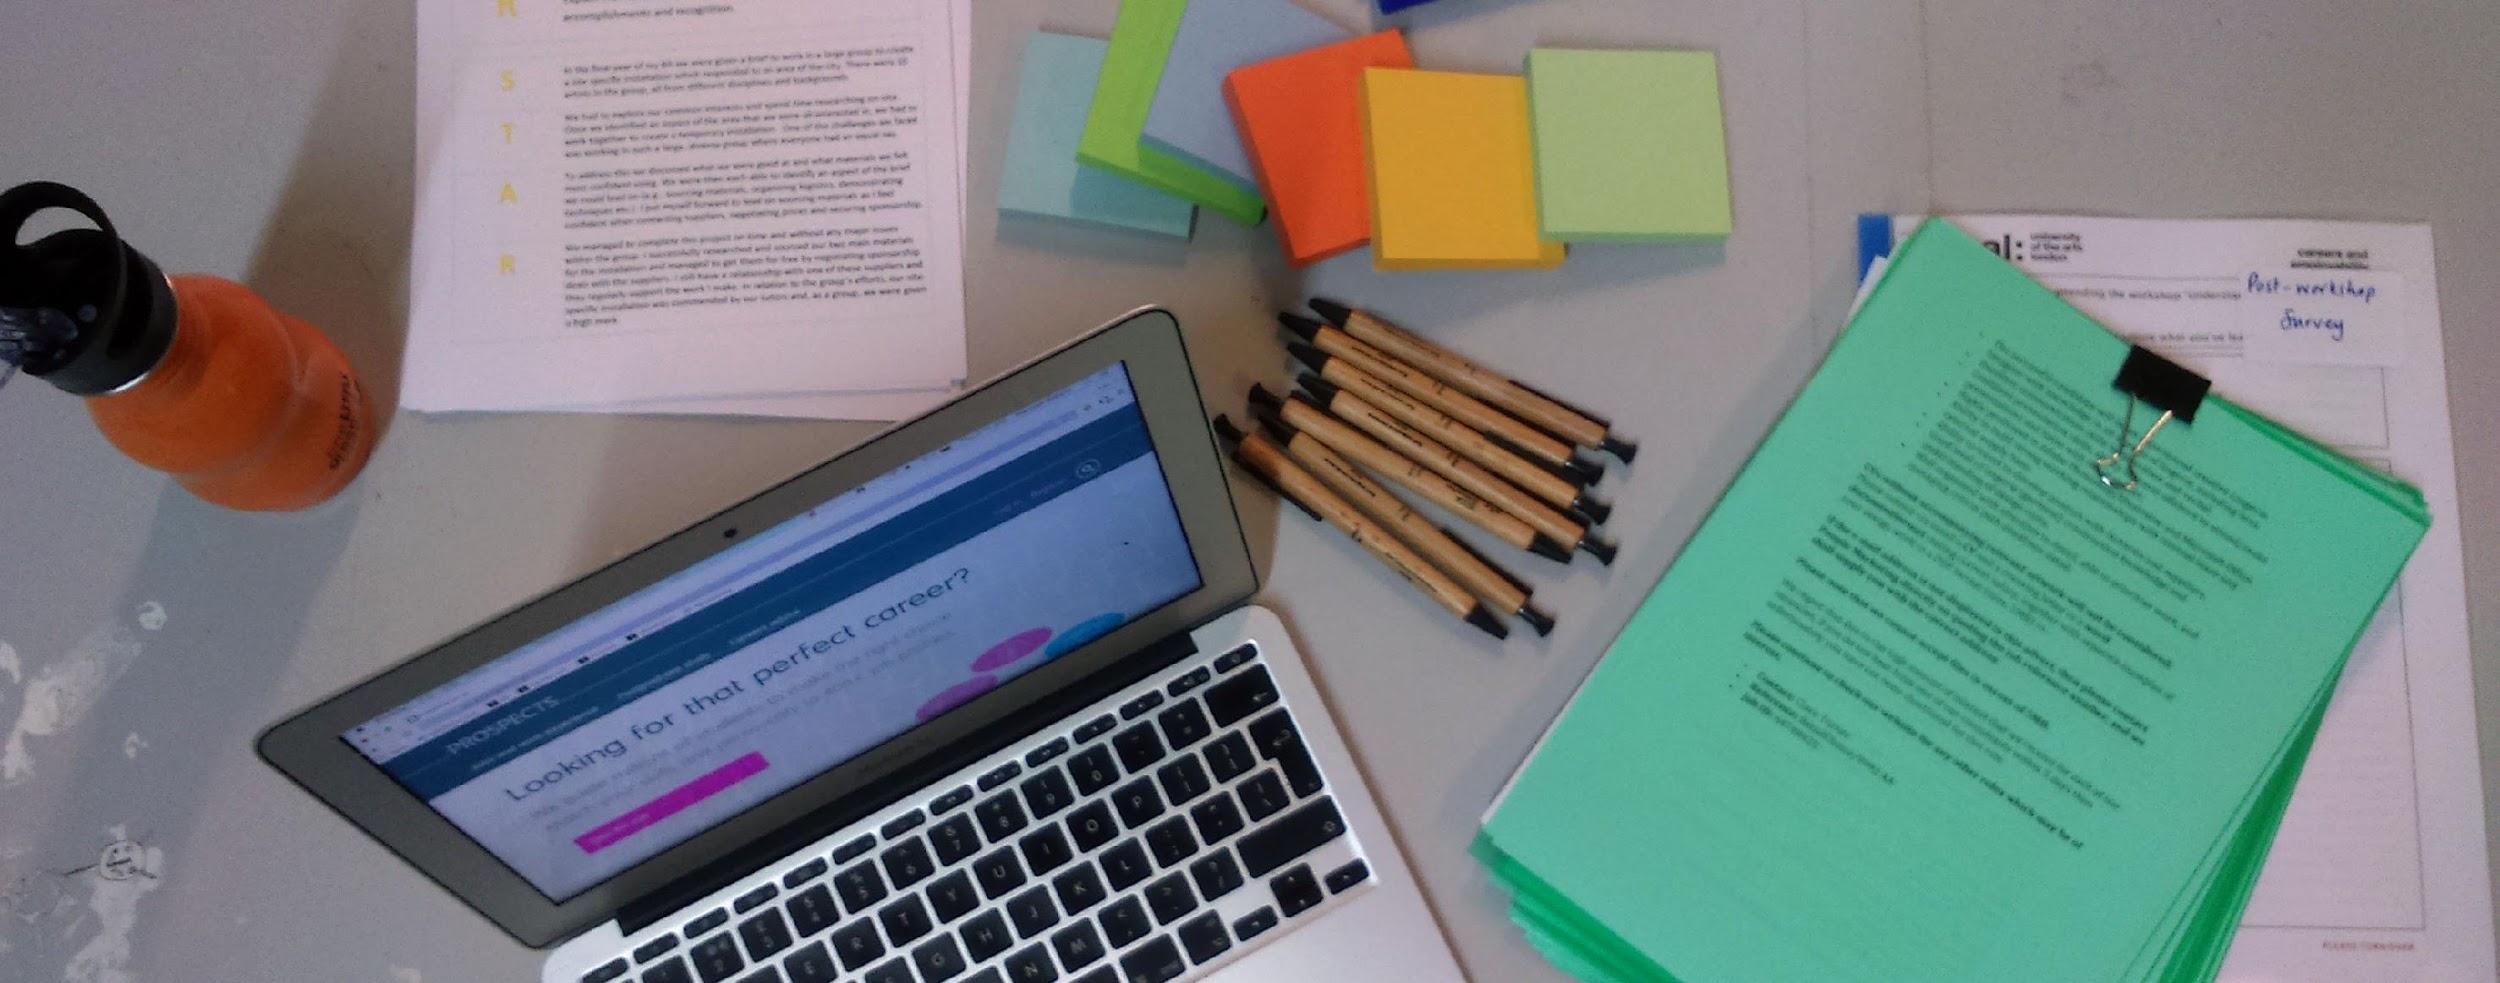 shakespeare essay write bible